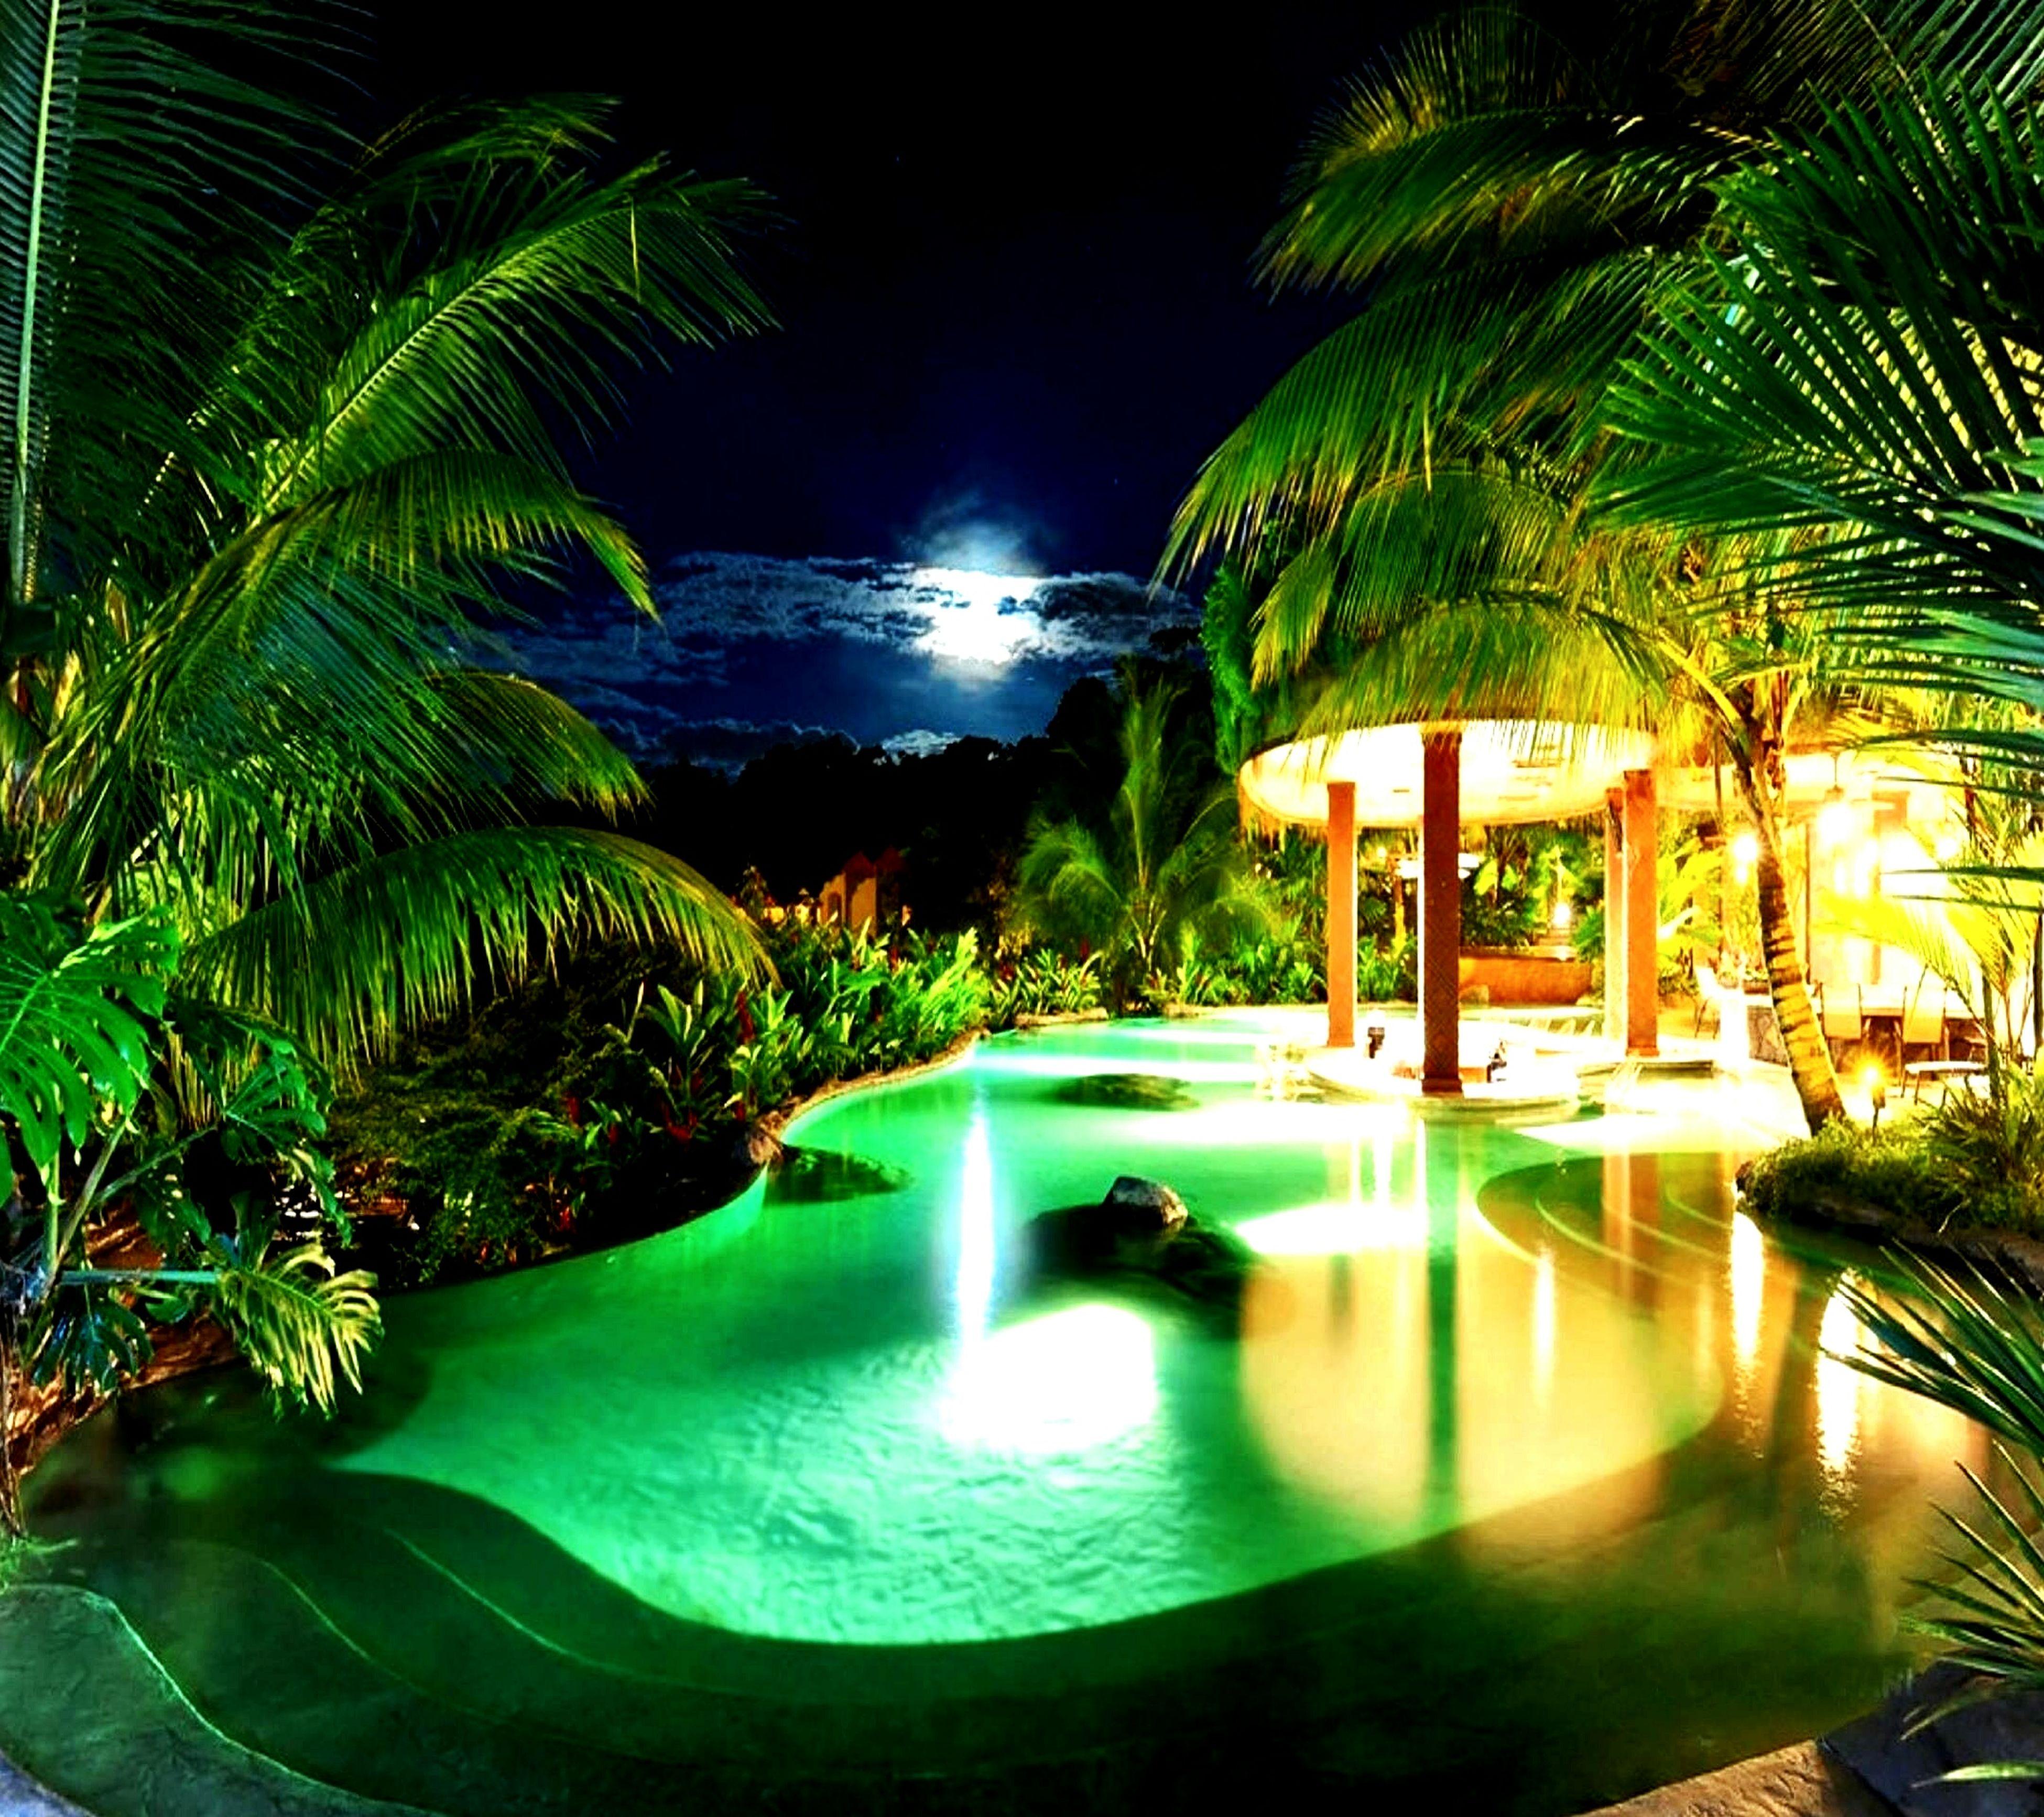 Mexico 😆 playa del carme 5 Star Hotel 🐰